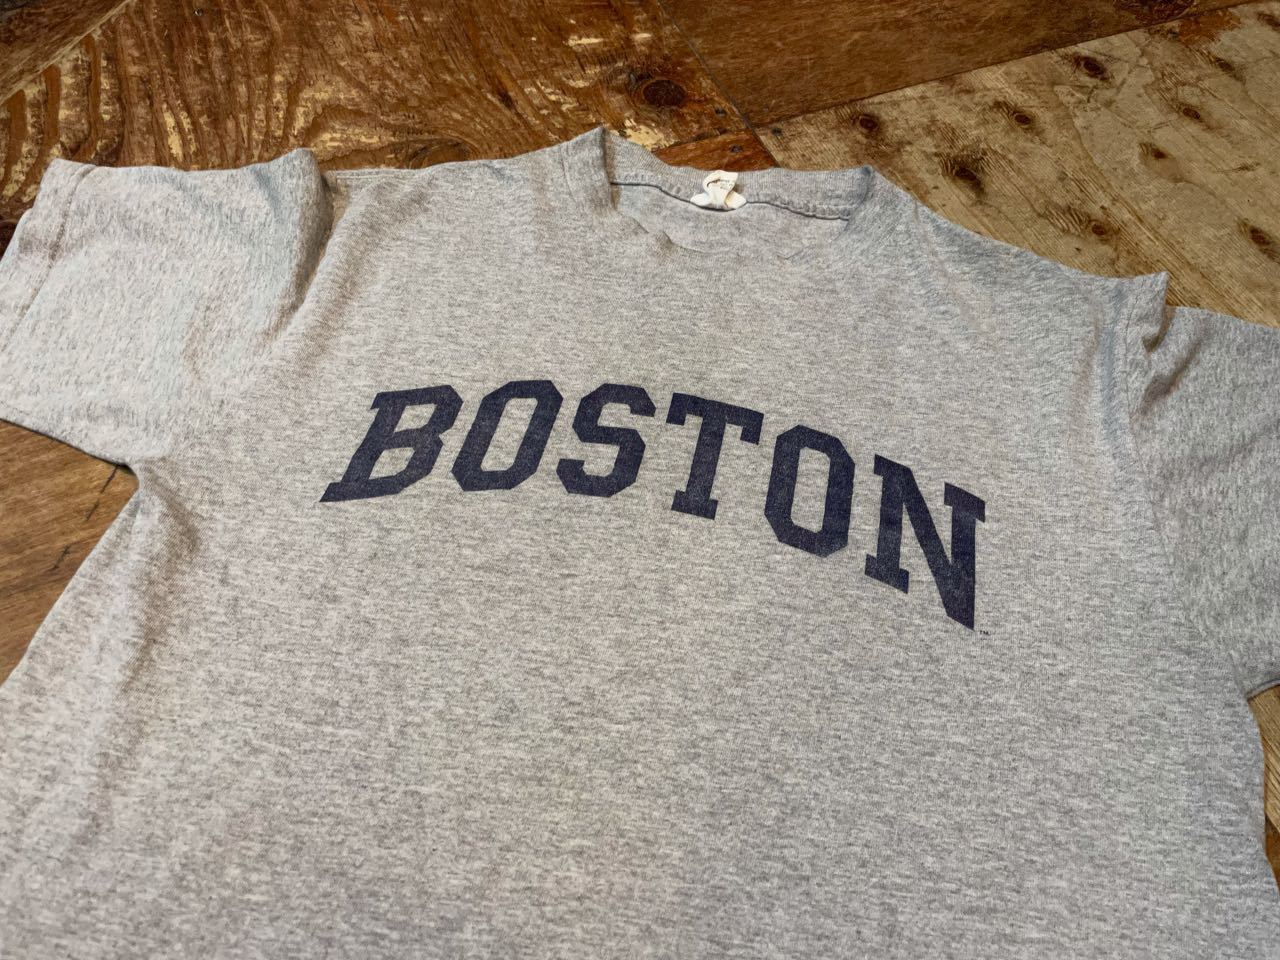 6月12日(土)入荷!80s Made in U.S.A the cotton exchange  BOSTON UNIVERSITY Tシャツ!_c0144020_13315454.jpg